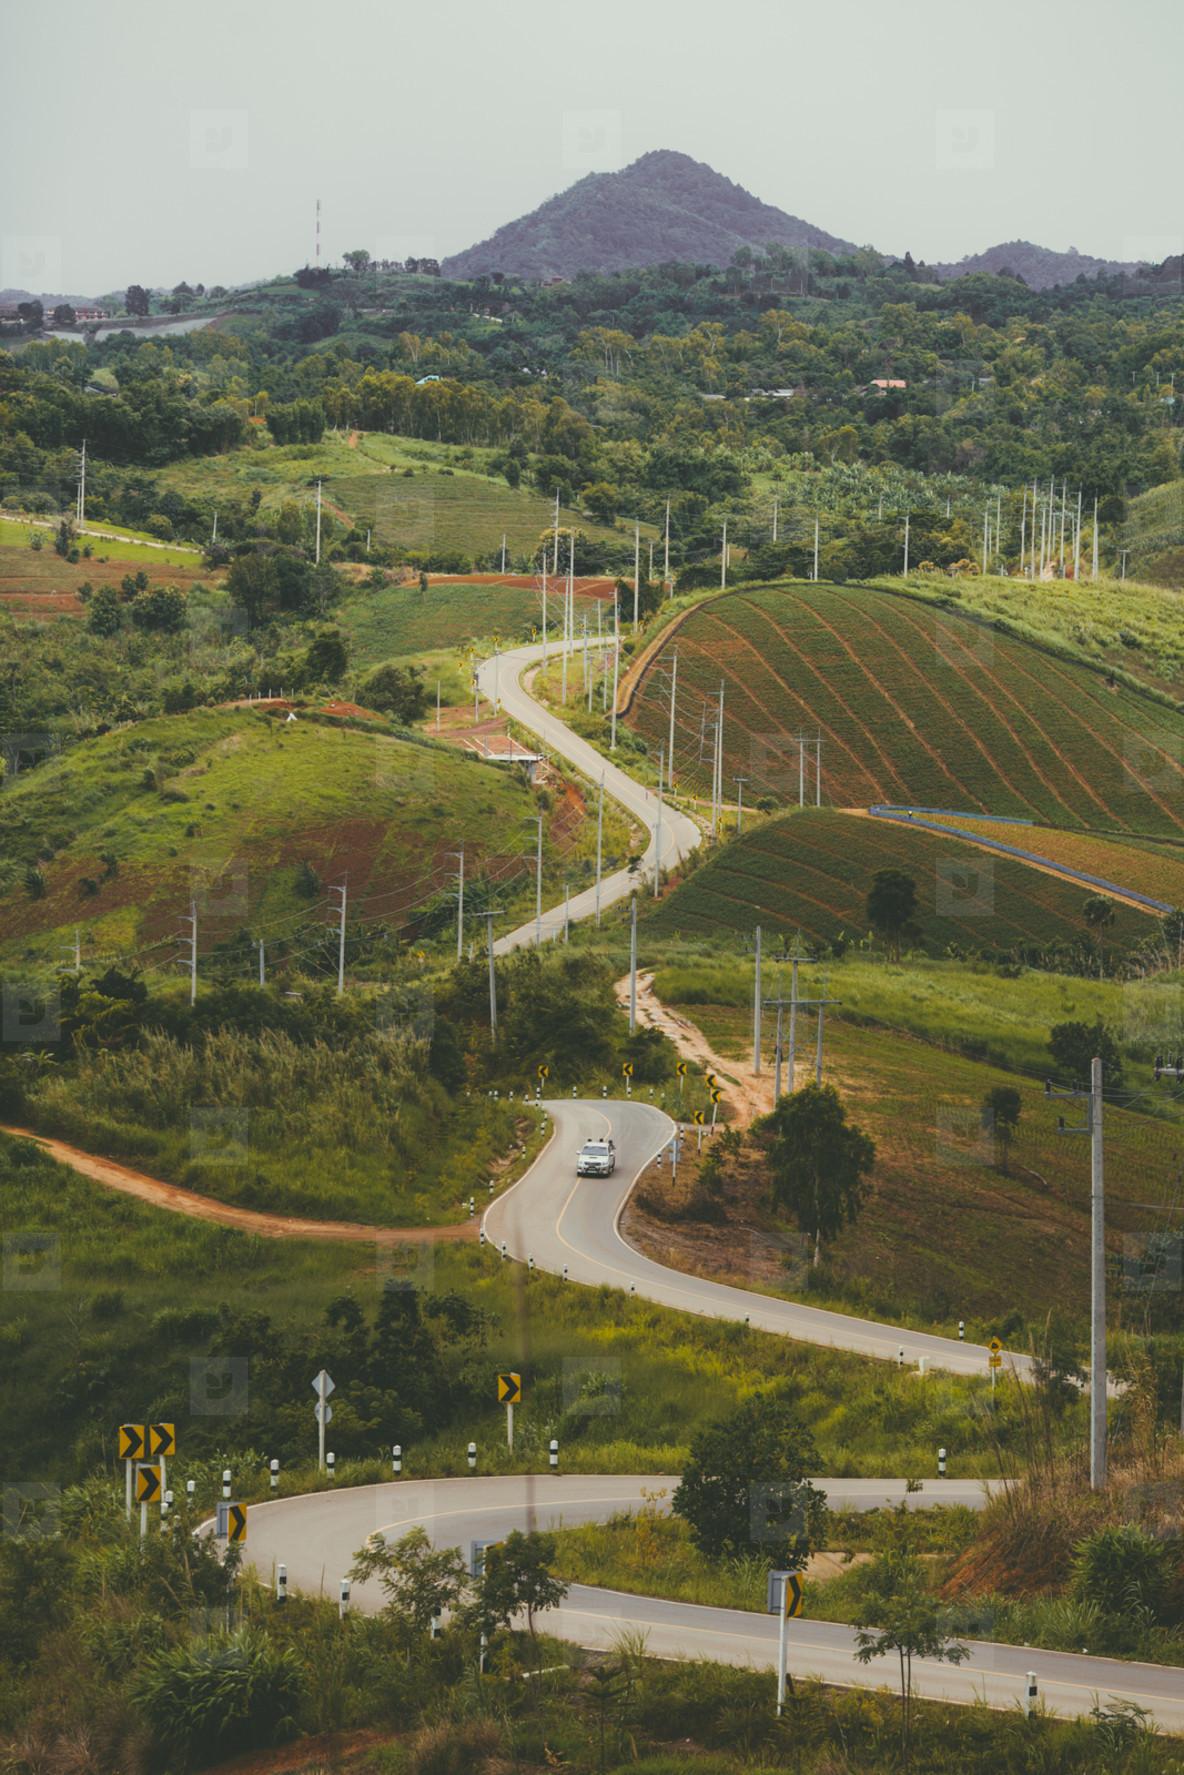 Mountain road